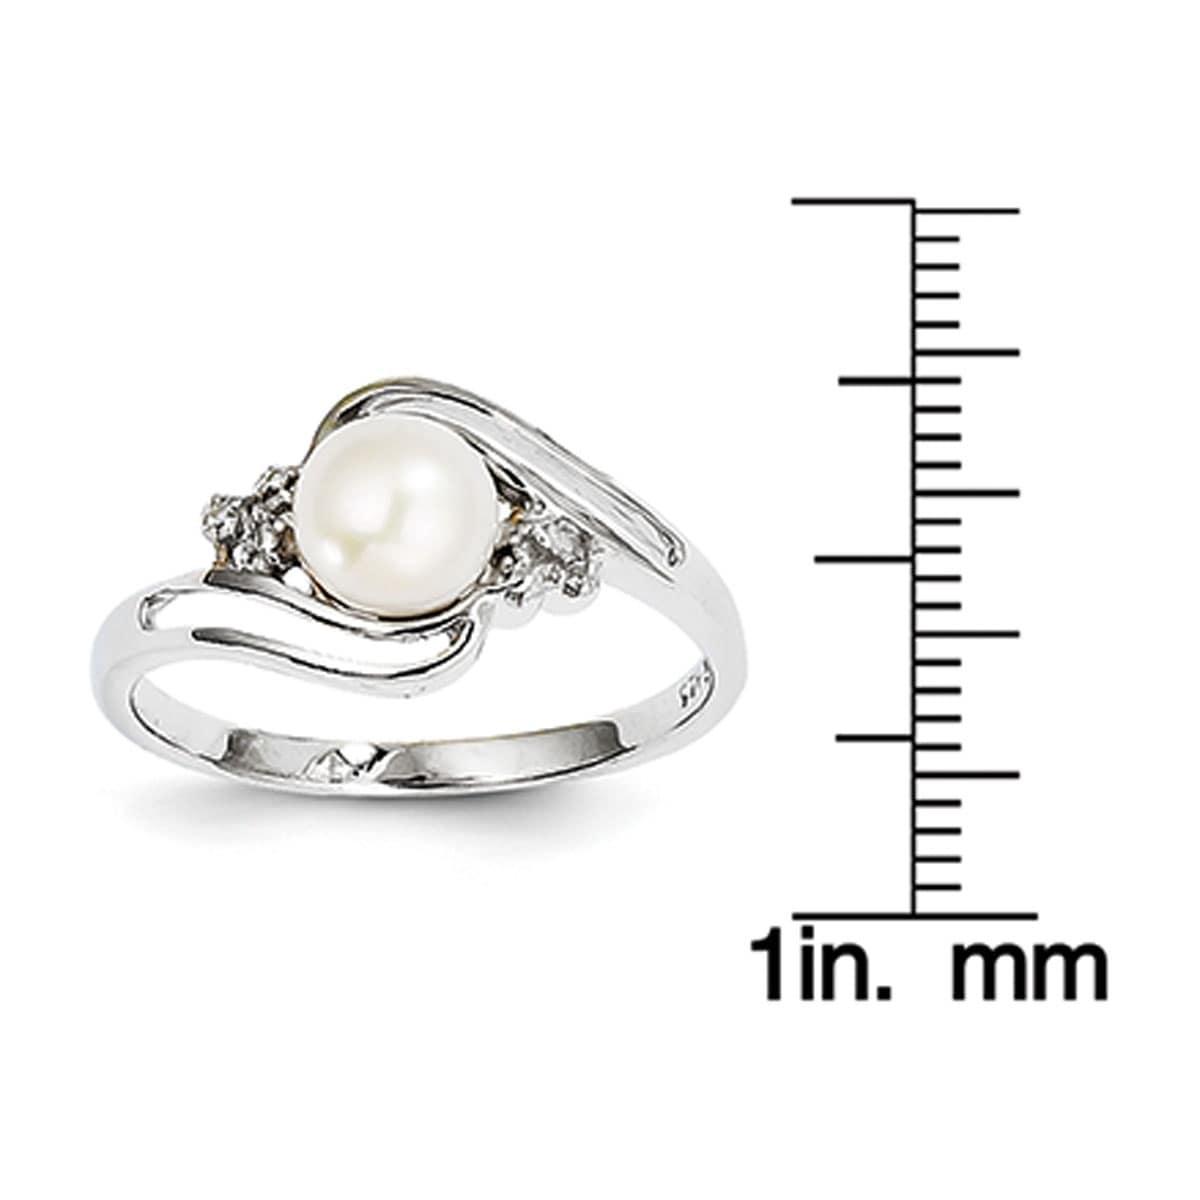 925 Silver Rhodium 6mm FW Cultured Button Pearl /& Diamond Ring QDX855 Size 6-8